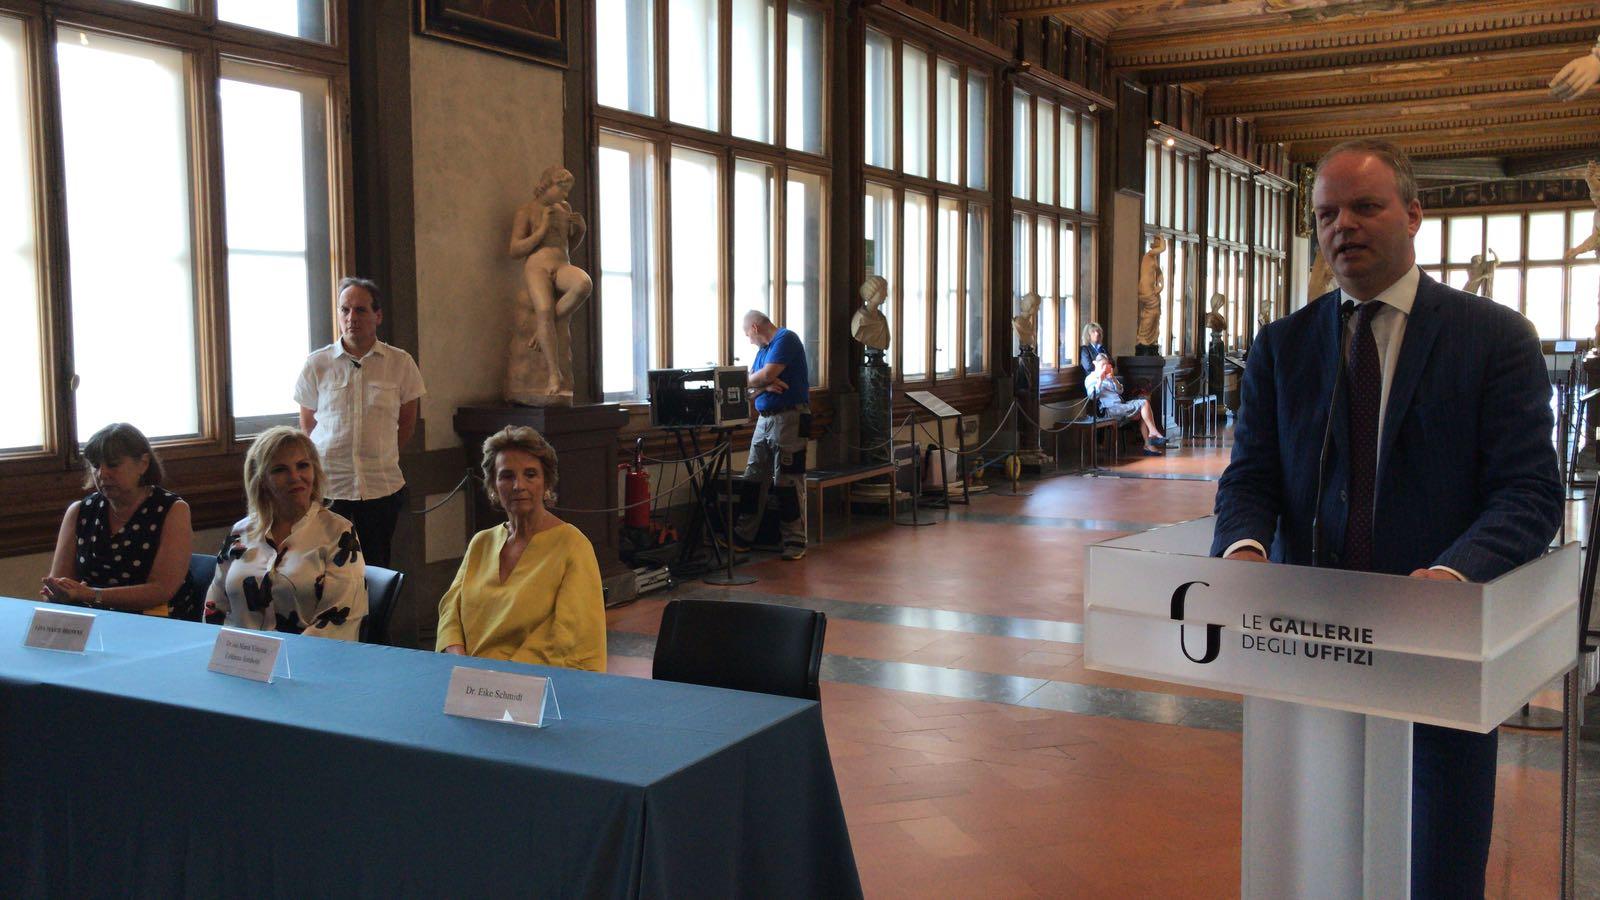 Uffizi: apre al pubblico la nuova sala dedicata a Leonardo